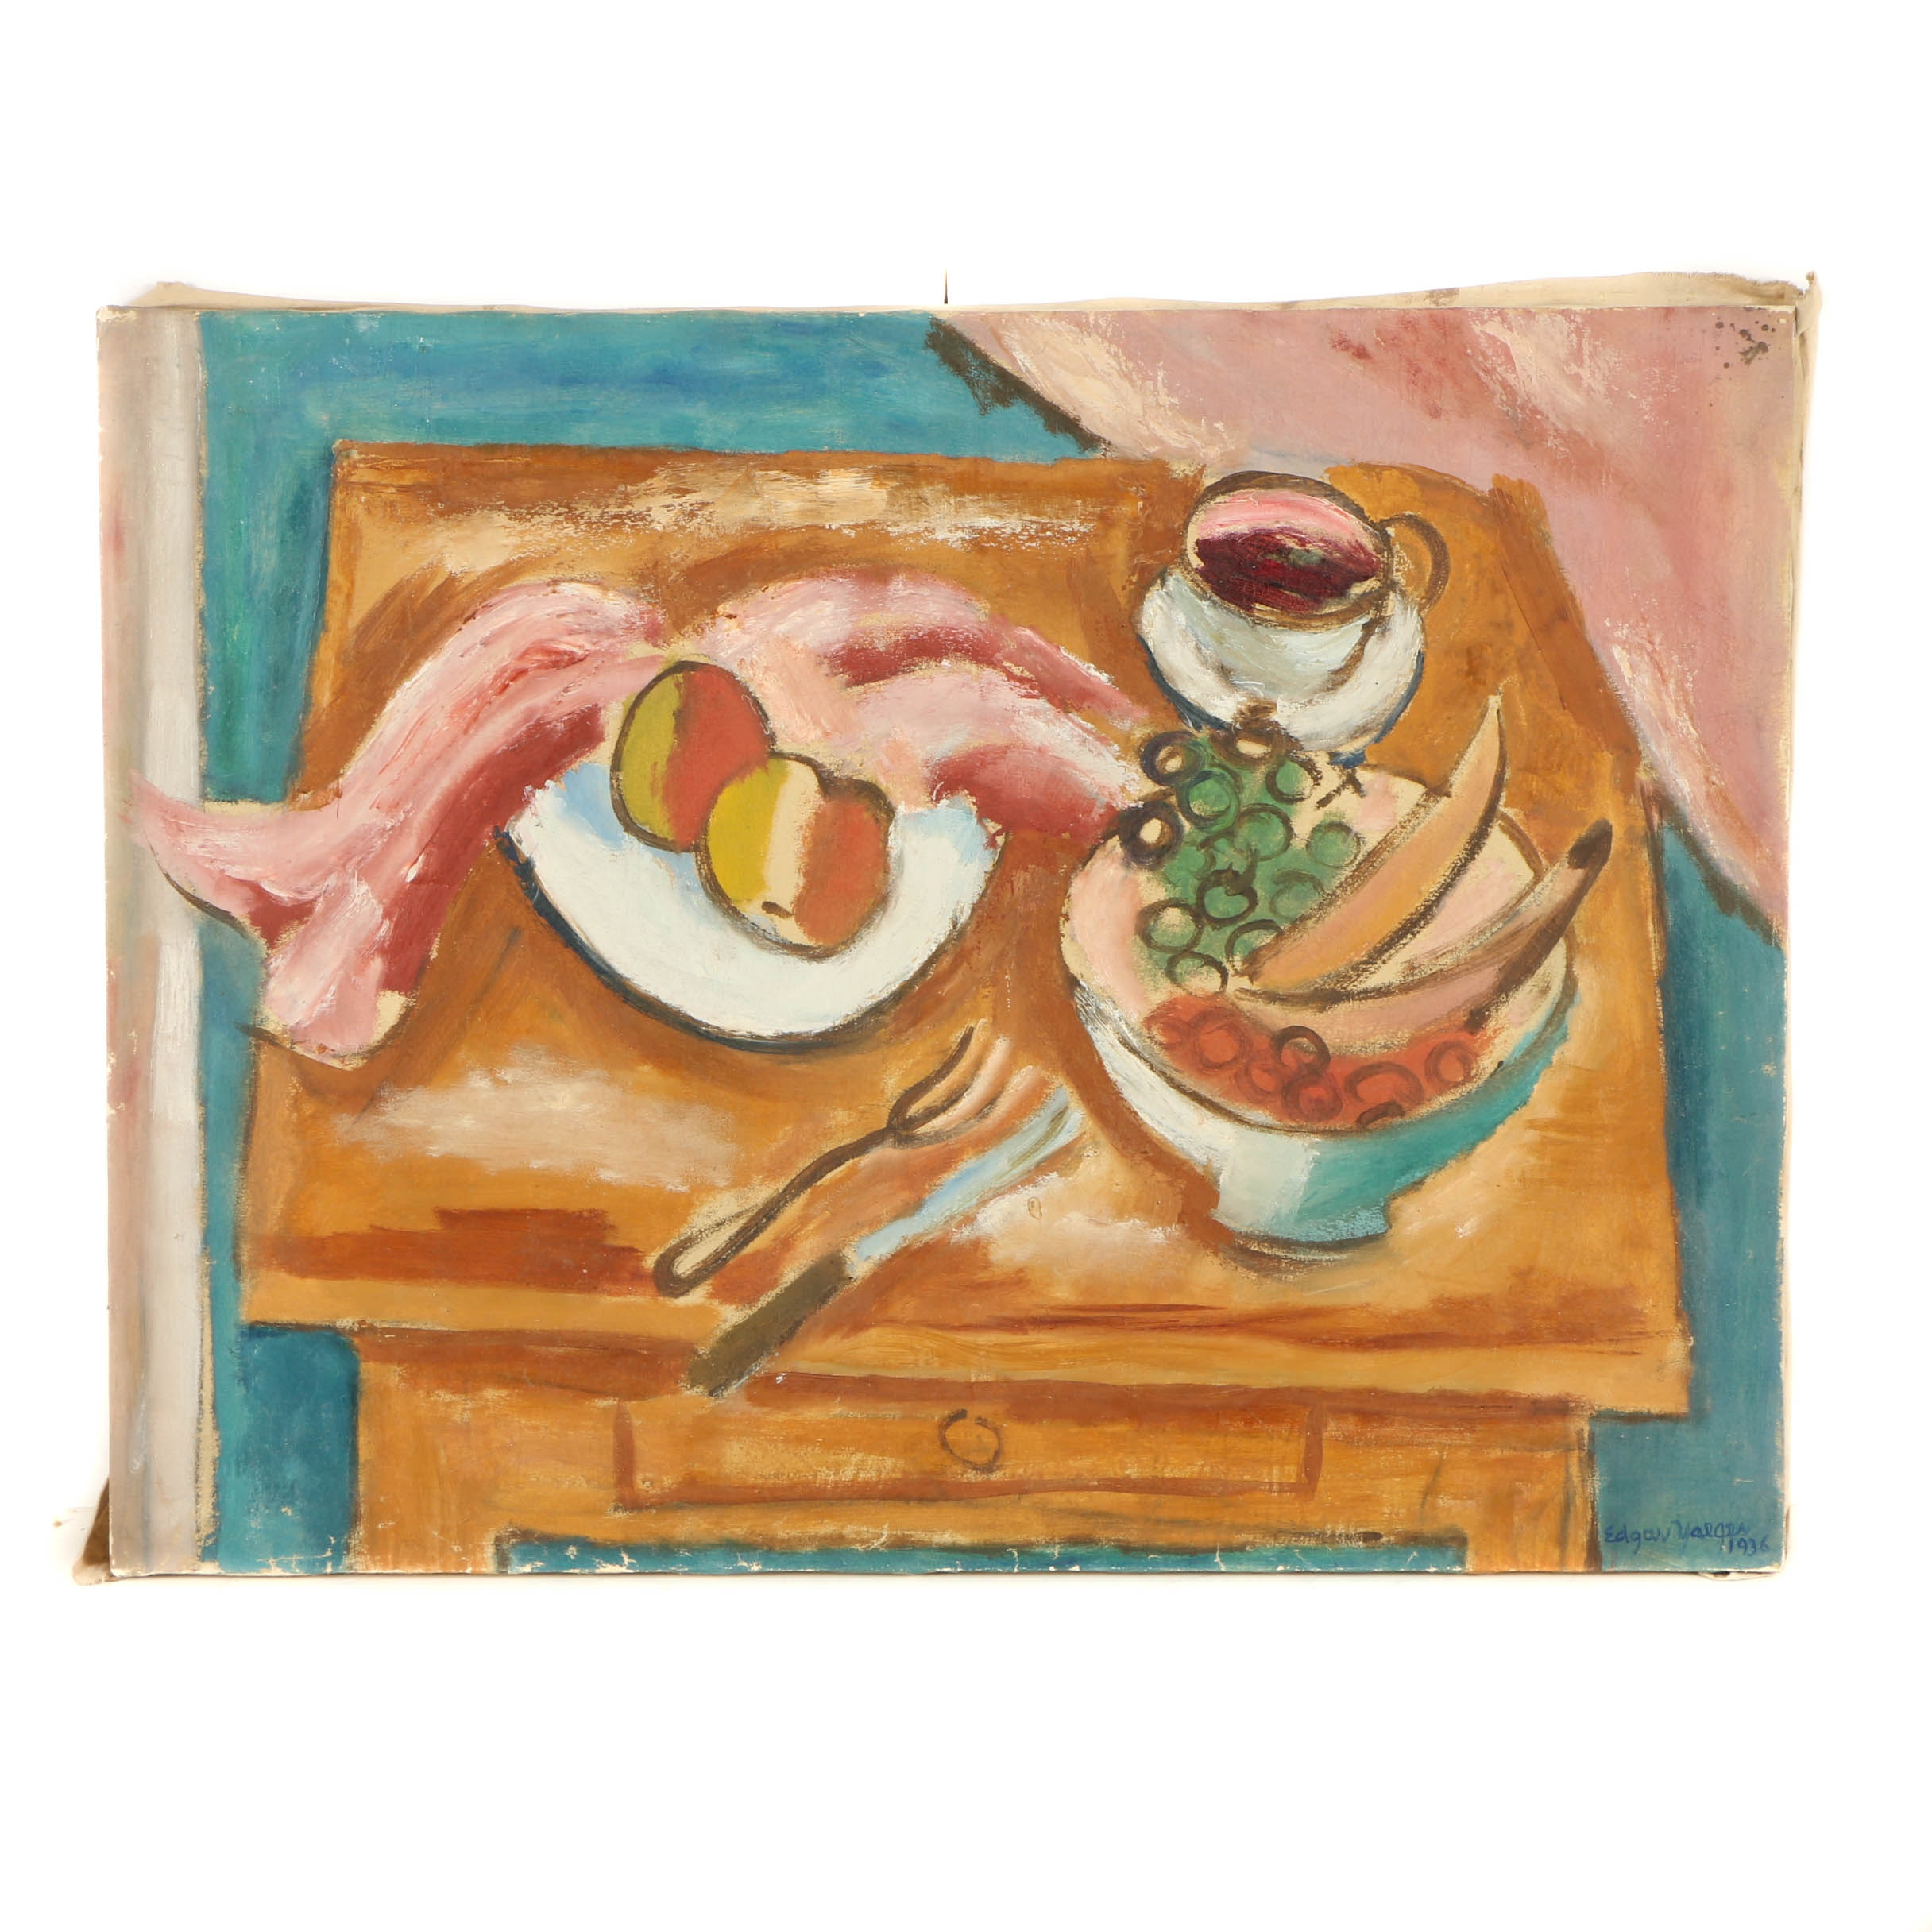 Edgar Yaeger Oil Painting on Canvas of a Still-Life